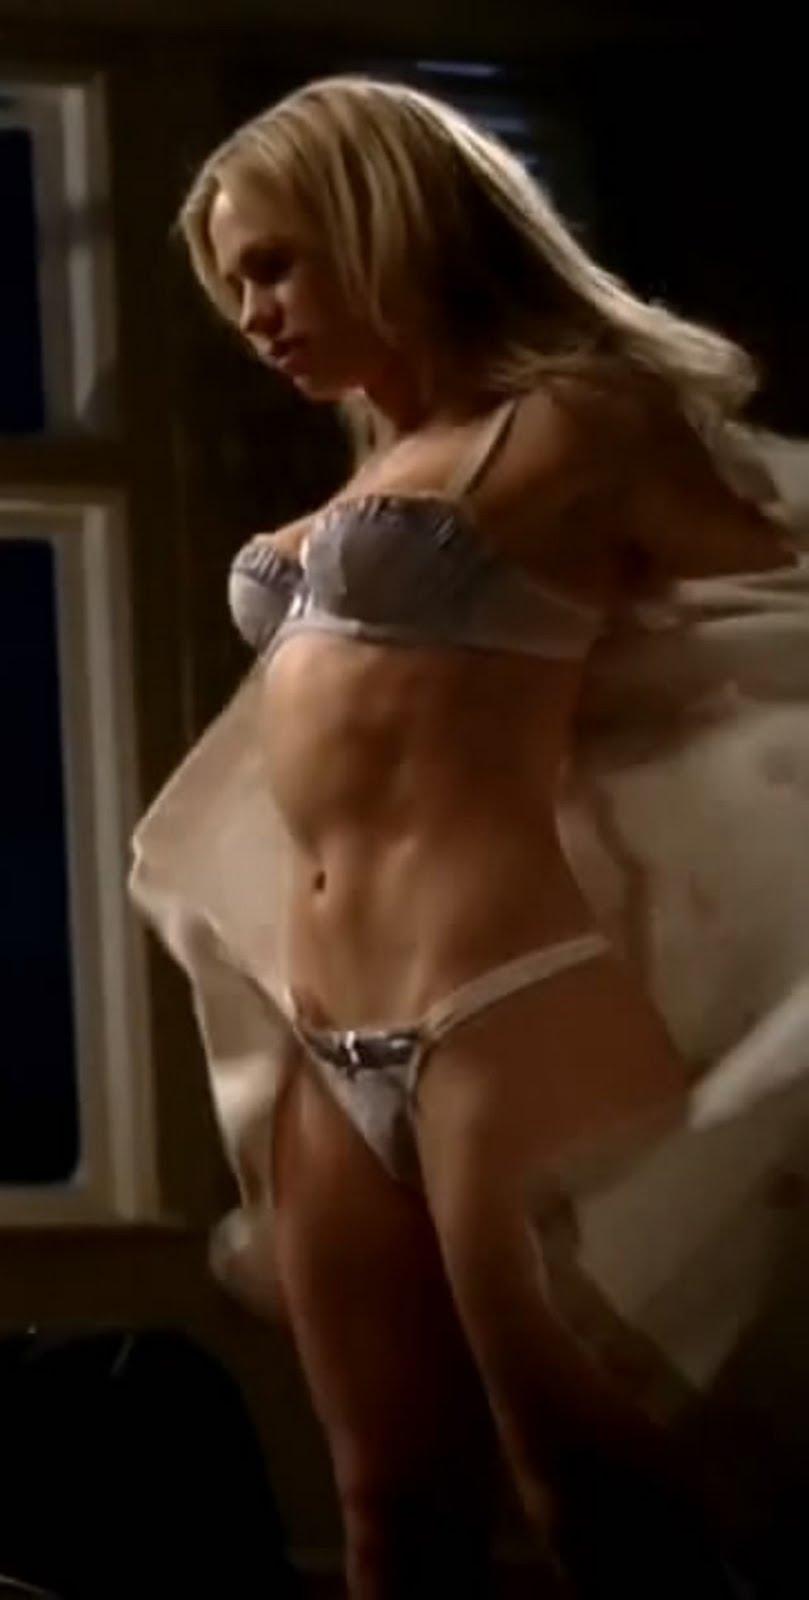 Aimee addison a hot mom to fuck 2